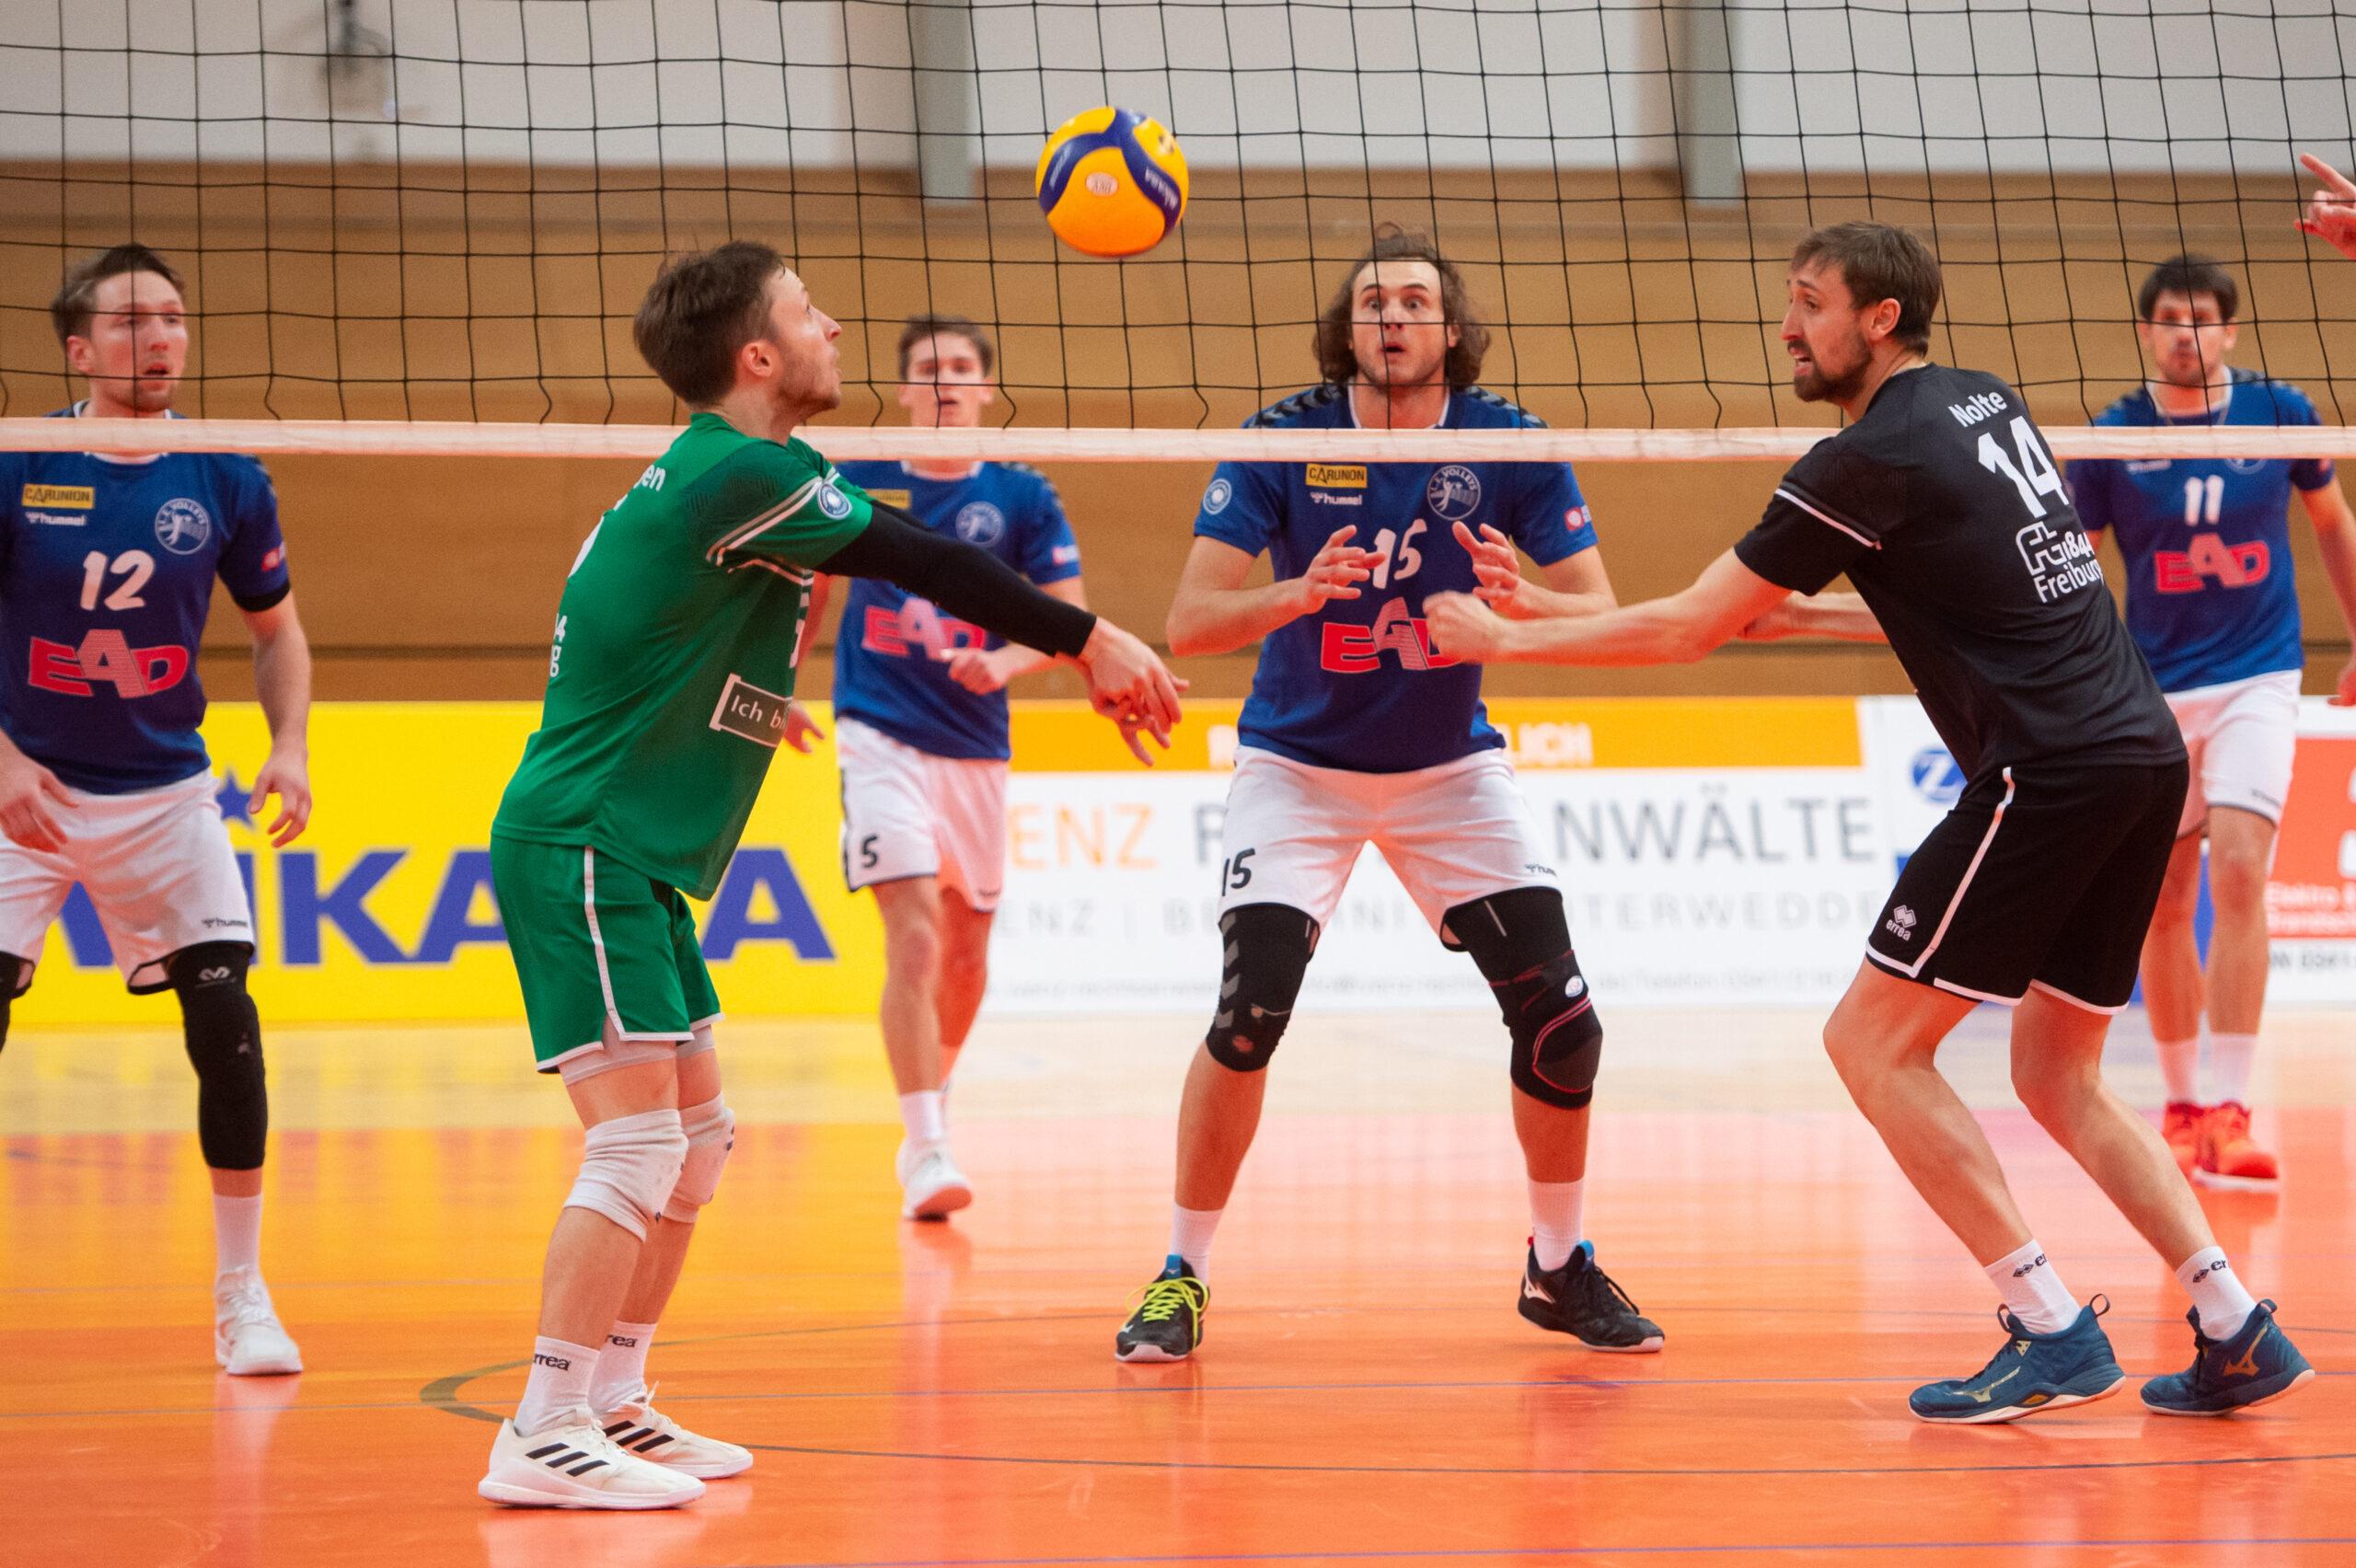 Henrik Kamphausen (Volleys #15) blickt auf den Ball -  L.E. Volleys Leipzig vs FT 1844 Freiburg, Volleyball, 2.Liga, 13.03.2021